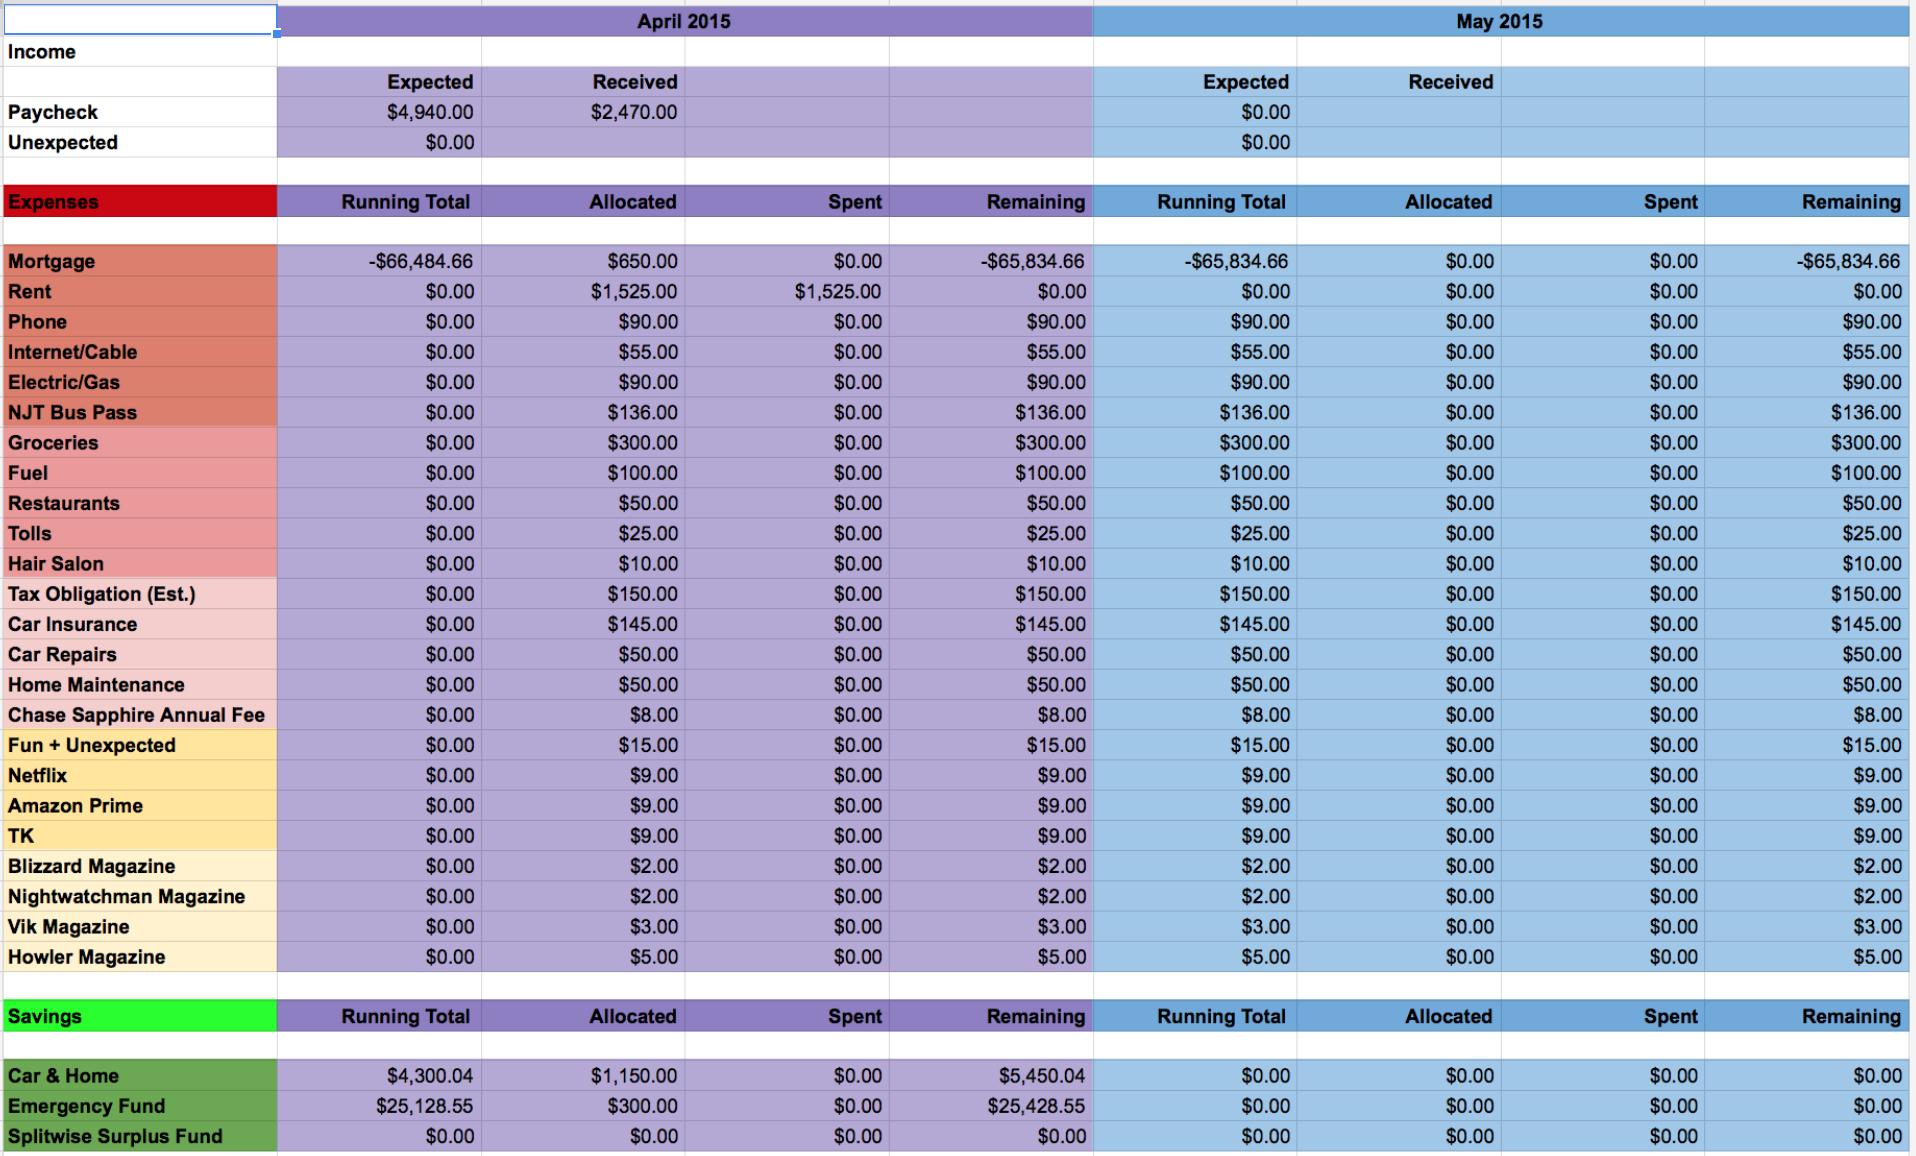 Budget Spreadsheet Reddit In Ynab In Excel : Personalfinance